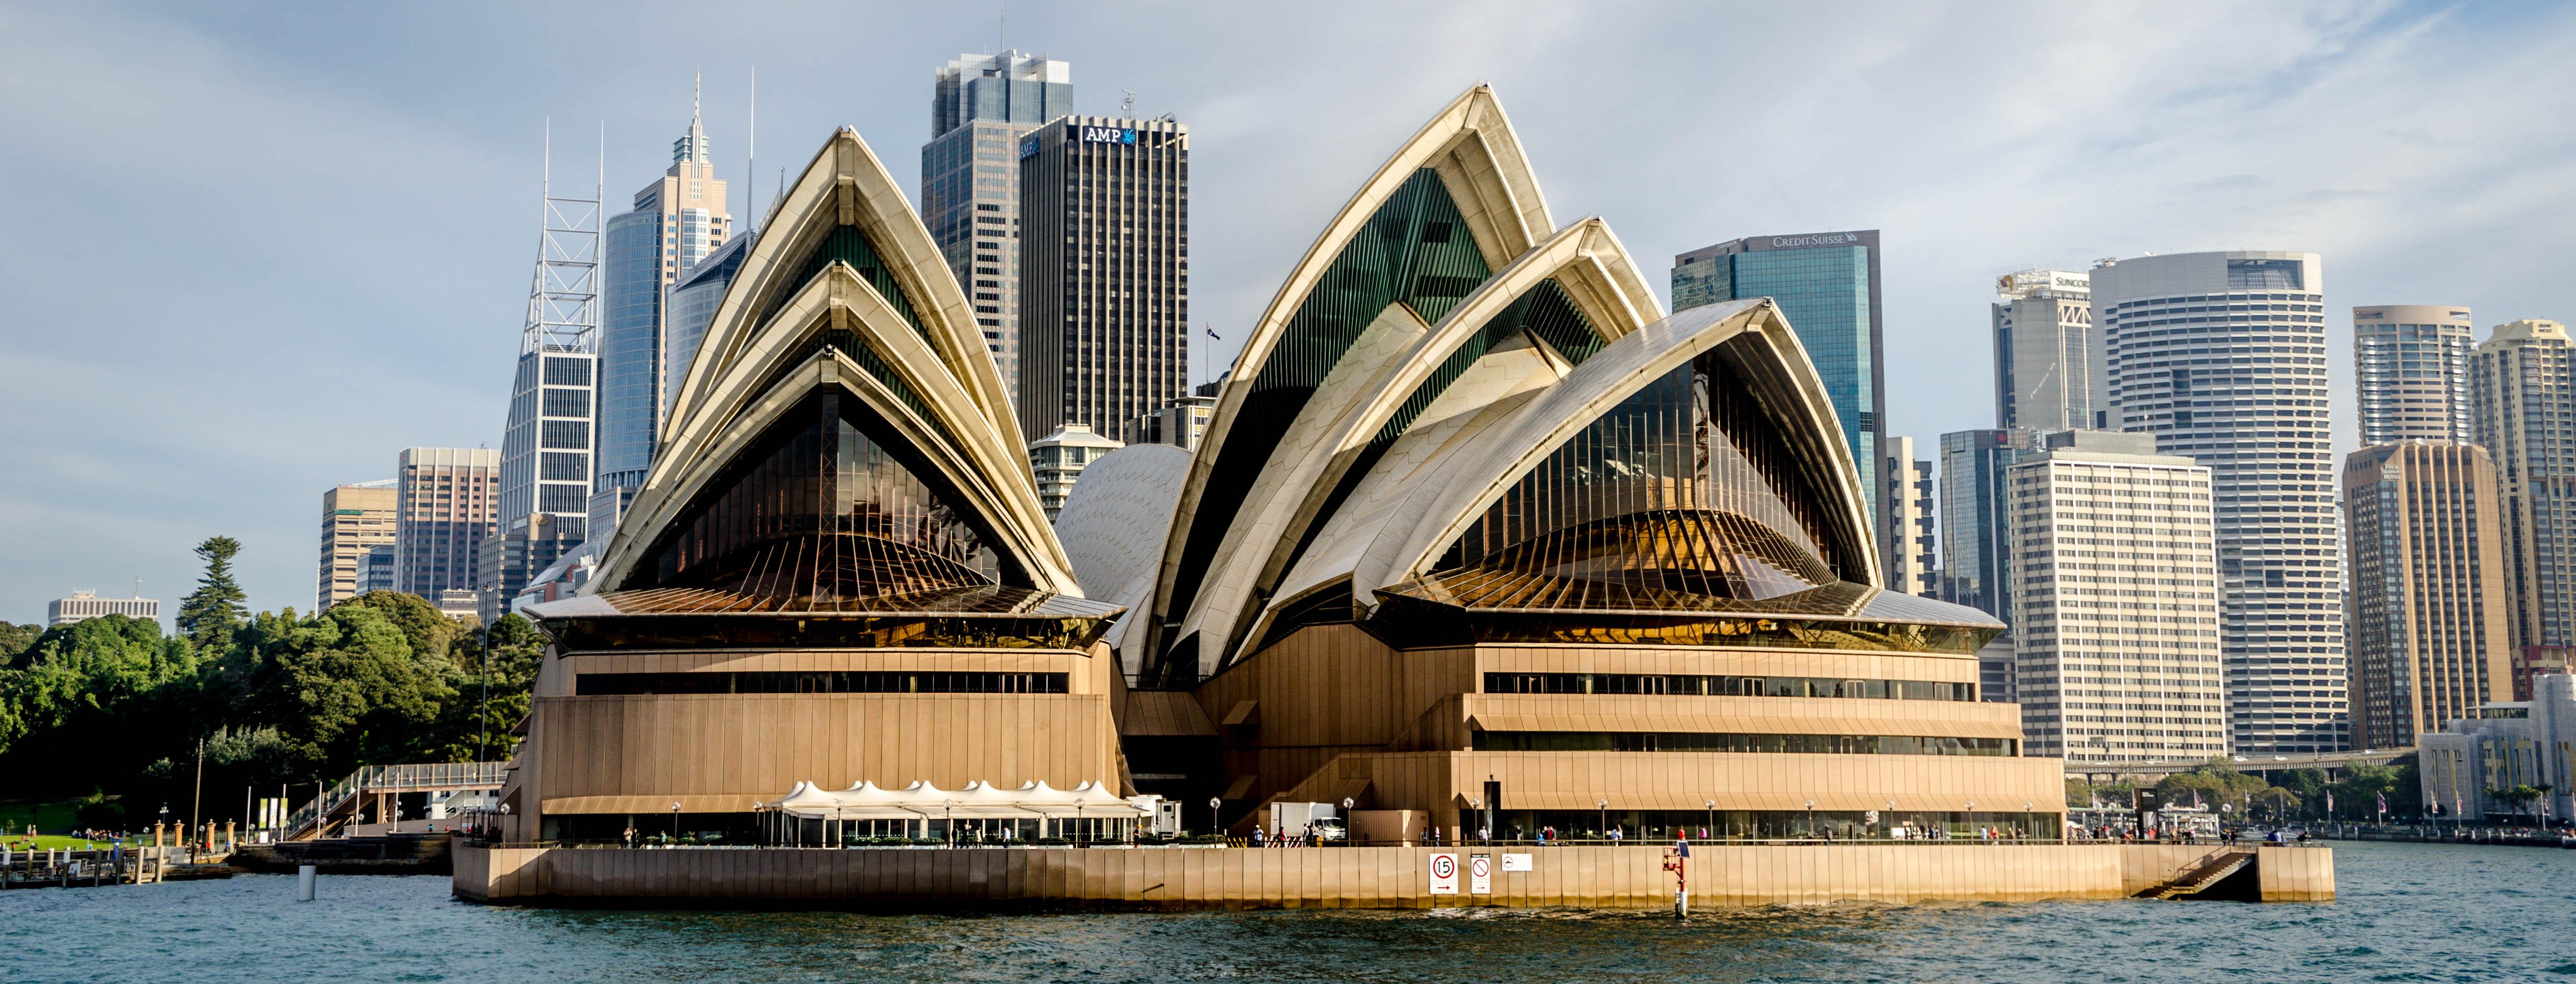 Sydney Opera House Australia  Gets Ready